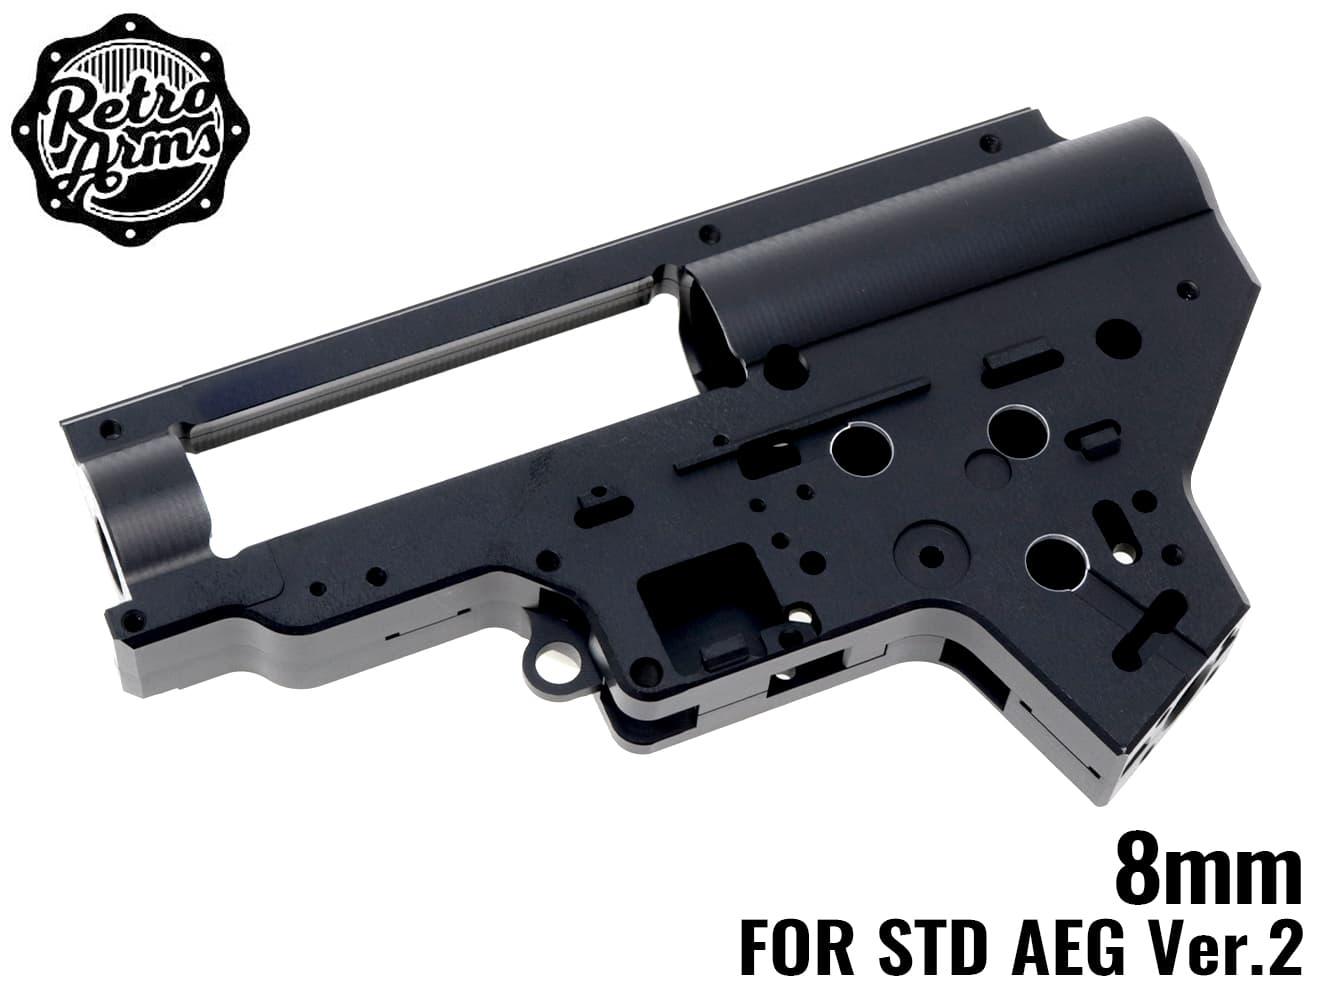 RETRO ARMS(レトロアームズ) GEN2 CNC 強化メカボックス V2-QSC◆東京マルイ製スタンダード電動ガン対応